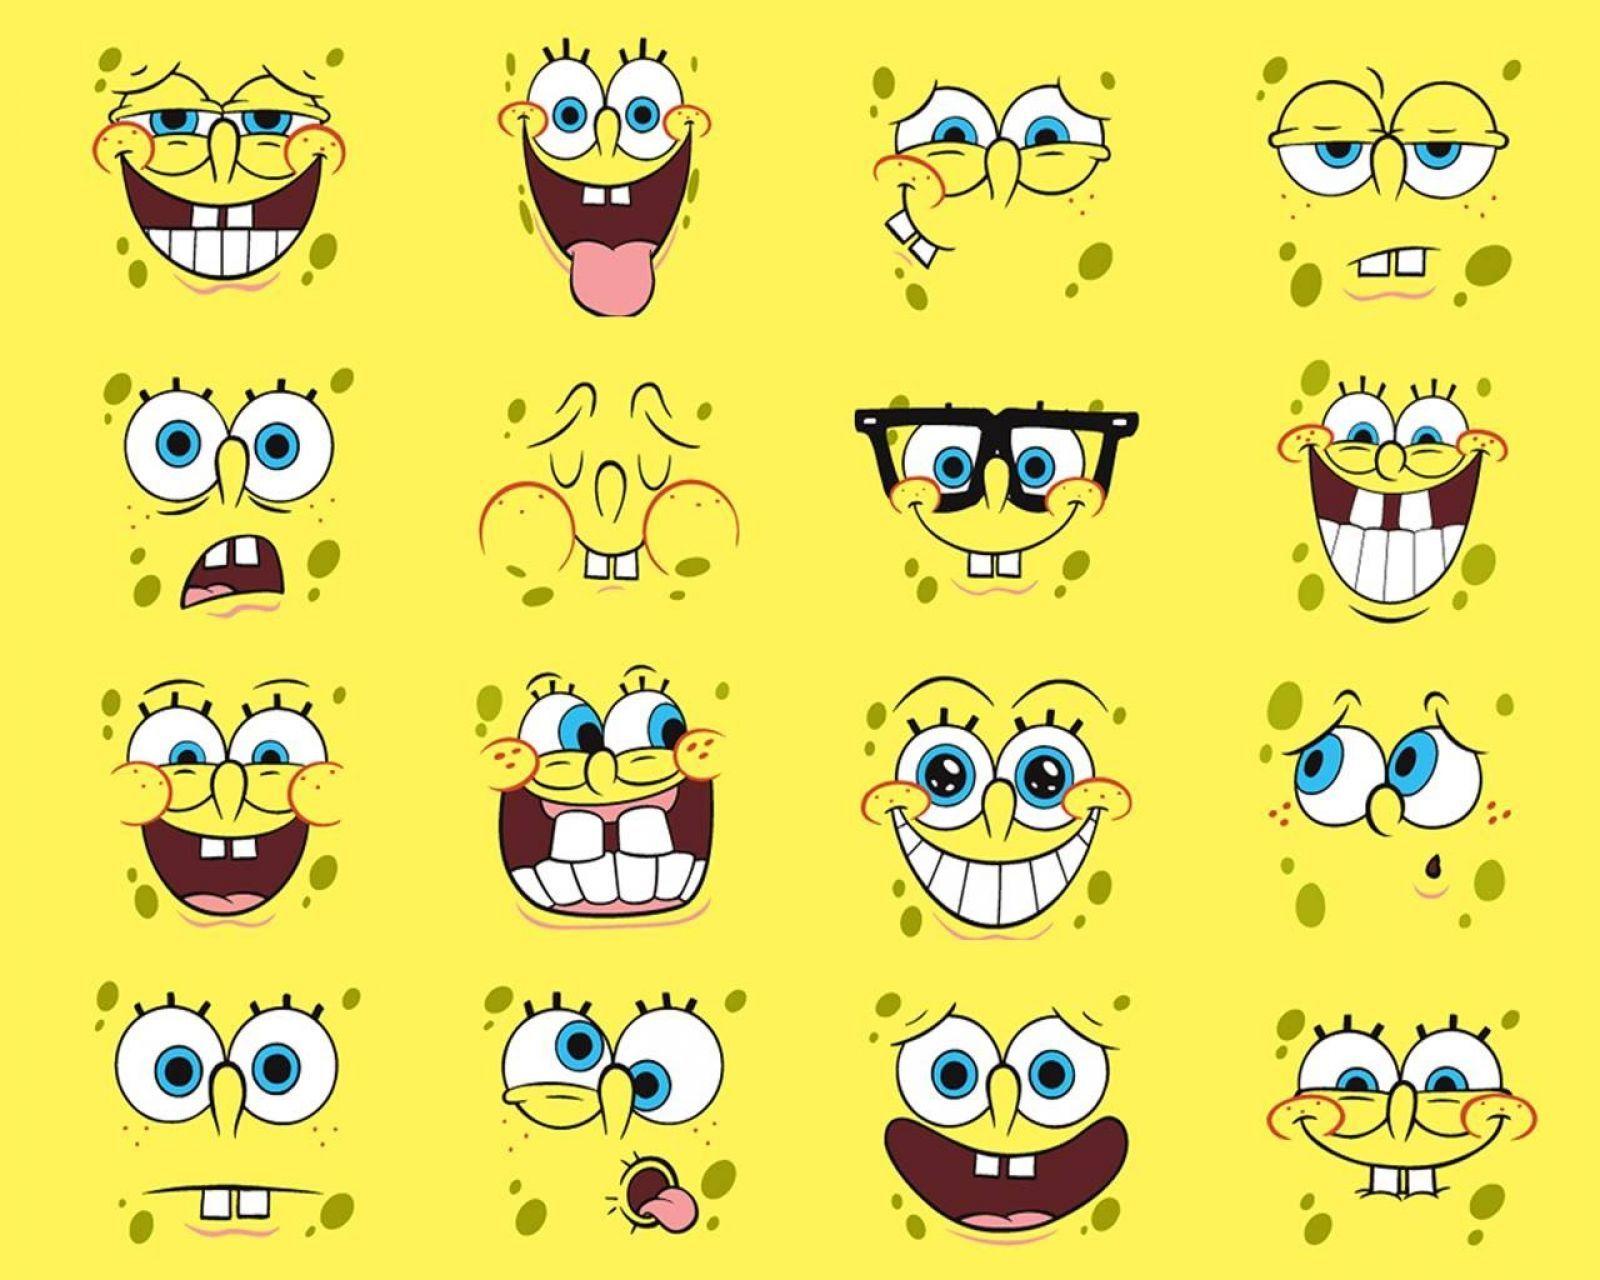 Caras De Bob Esponja Spongebob Drawings Spongebob Faces Spongebob Funny